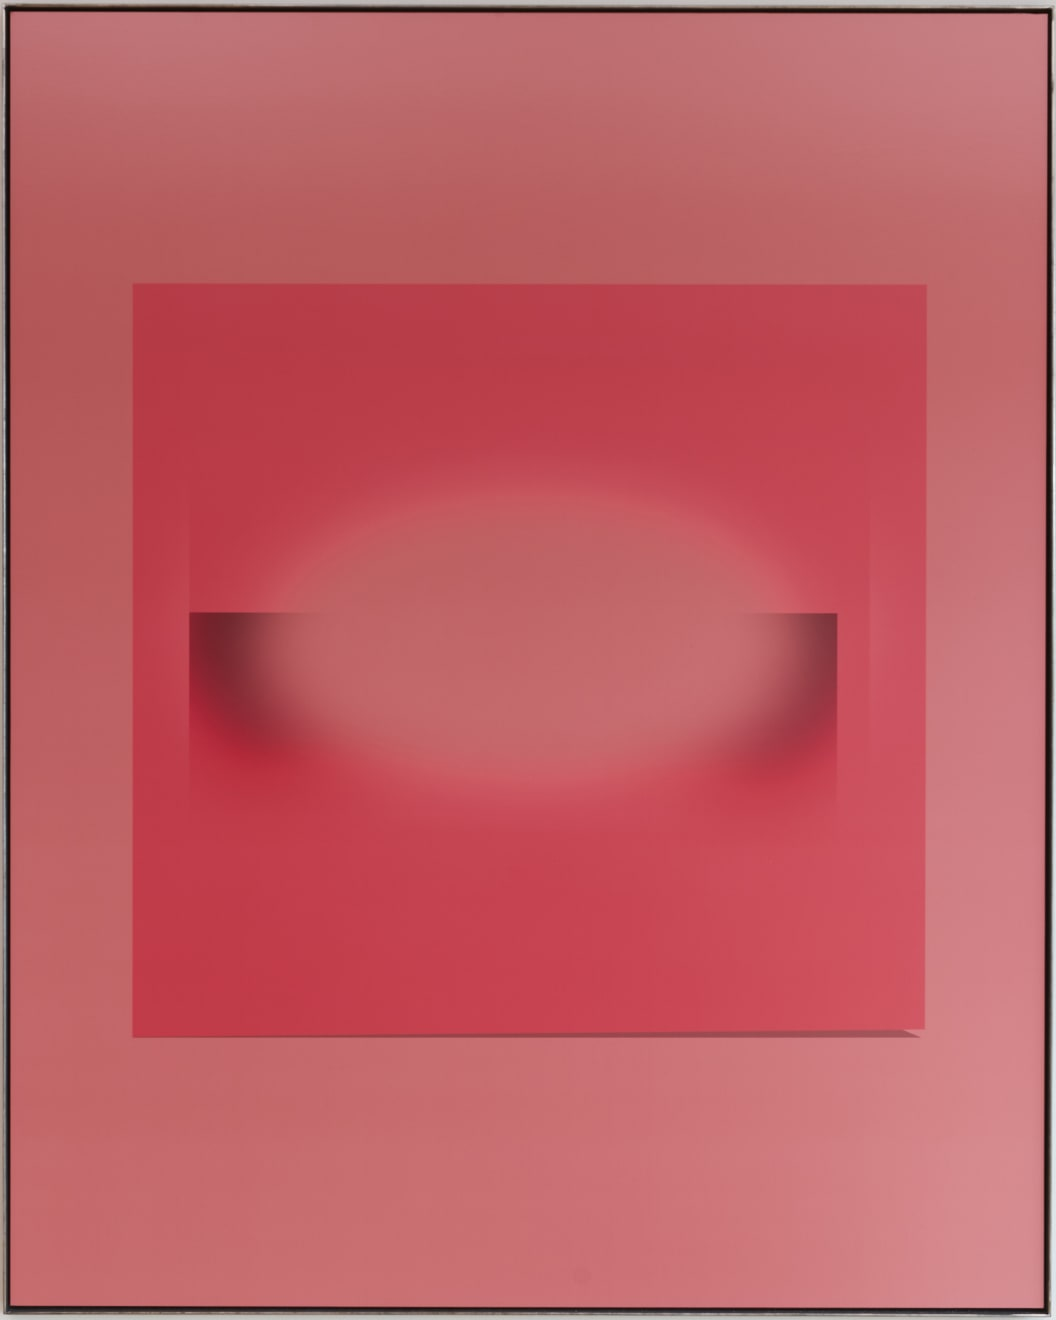 Nemo Nonnenmacher, Volume (red) , 2017